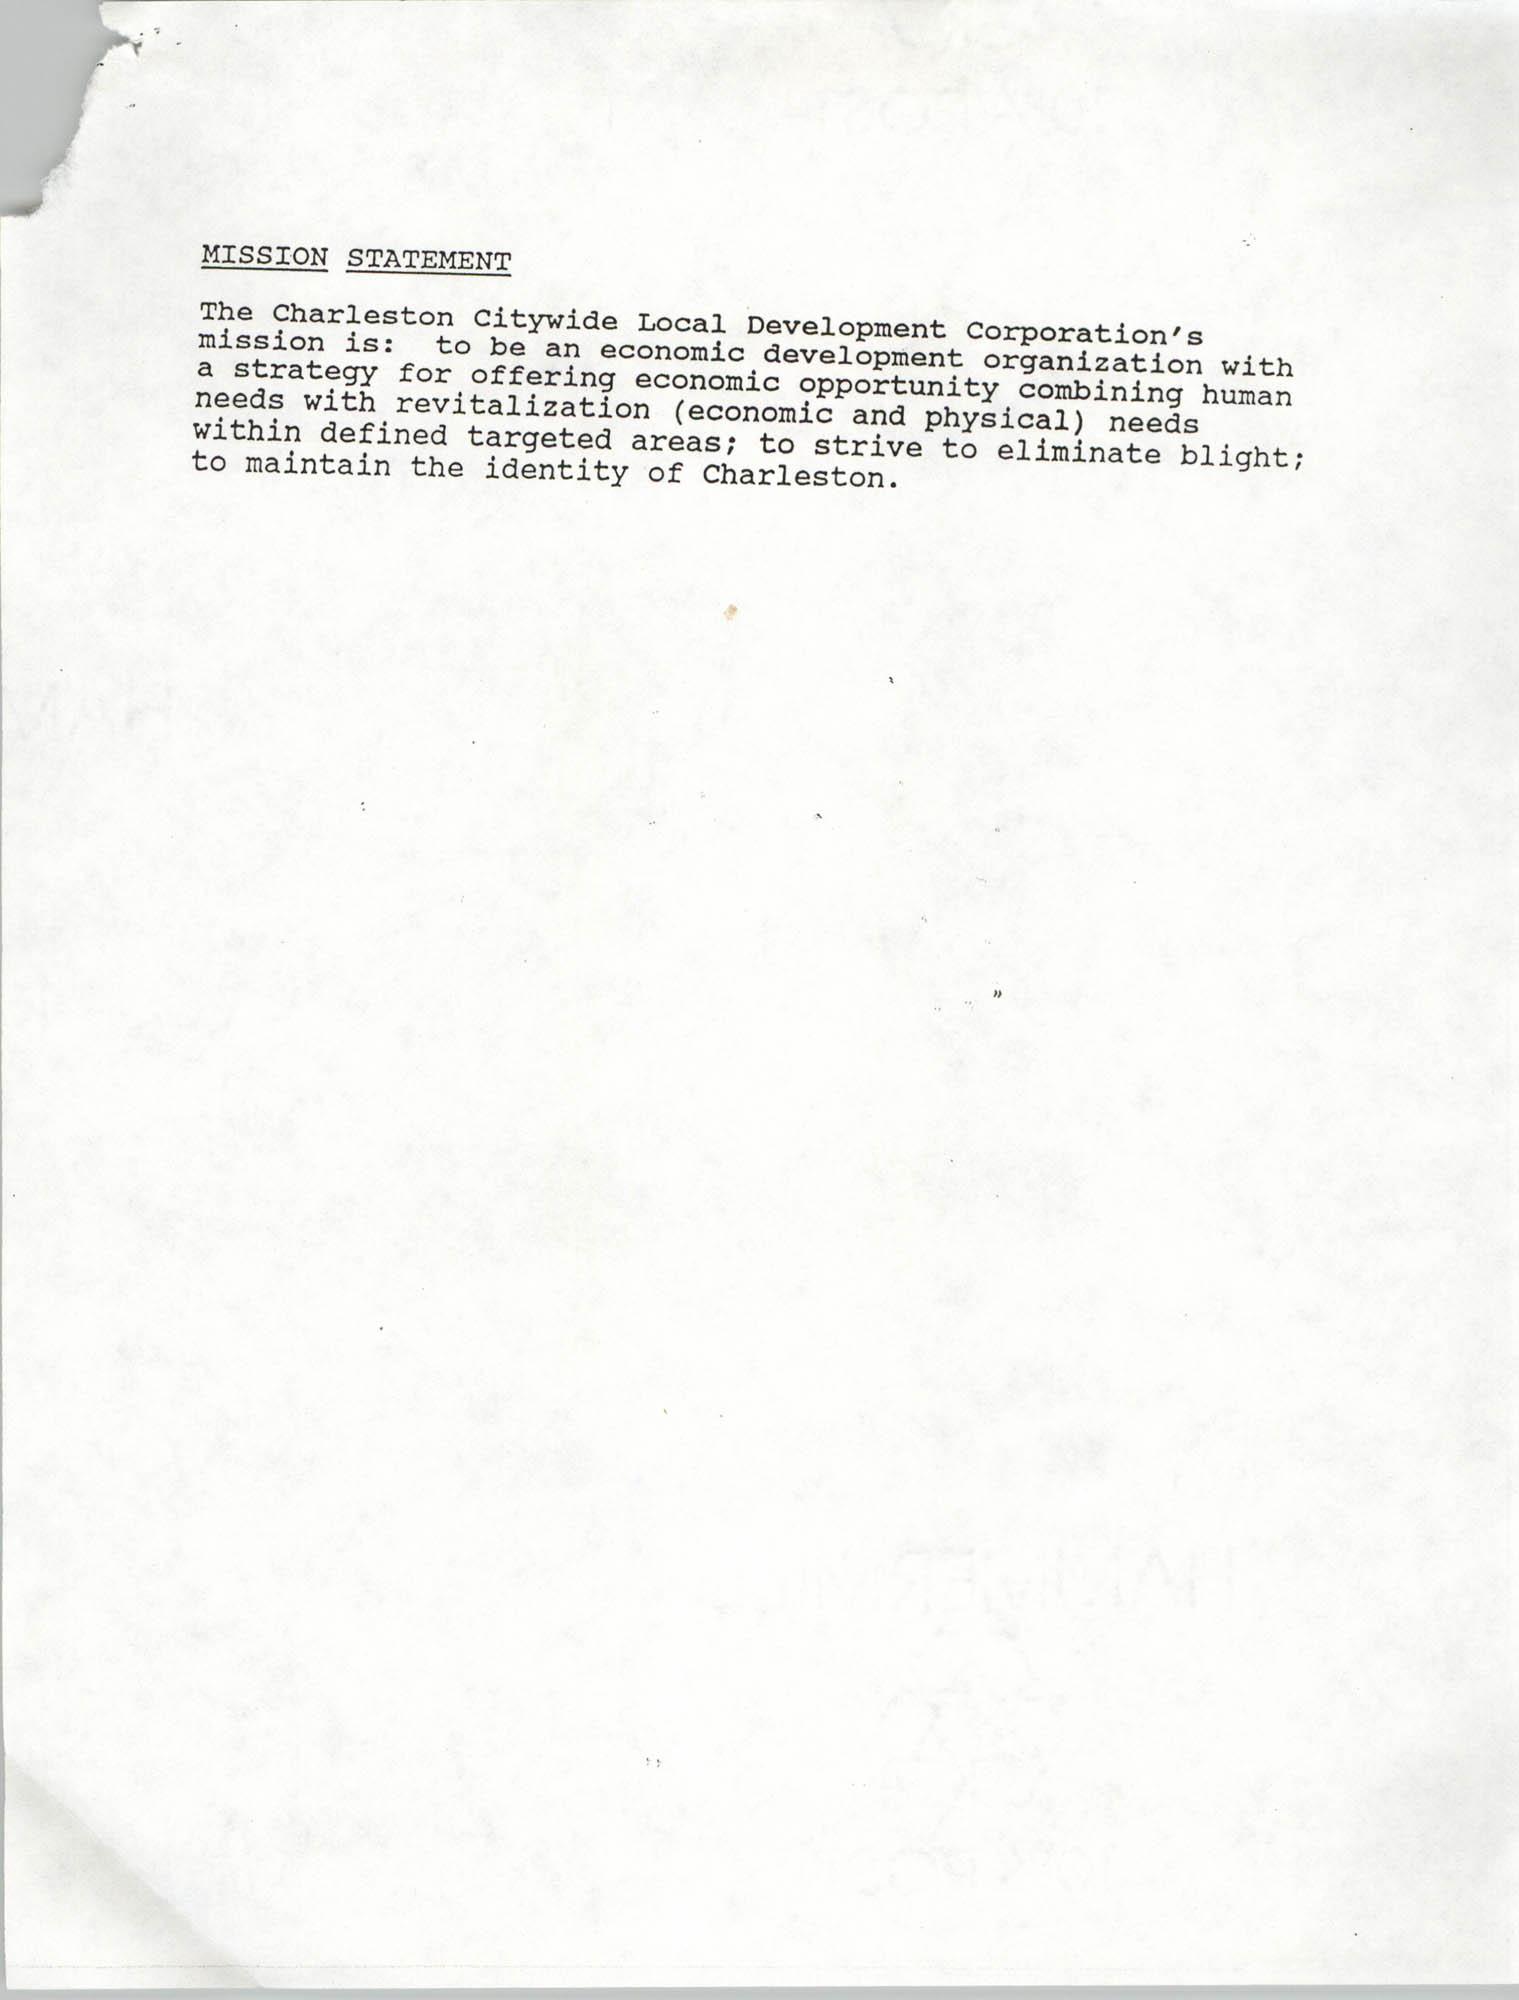 Charleston Citywide Local Development Corporation Charter, Mission Statement